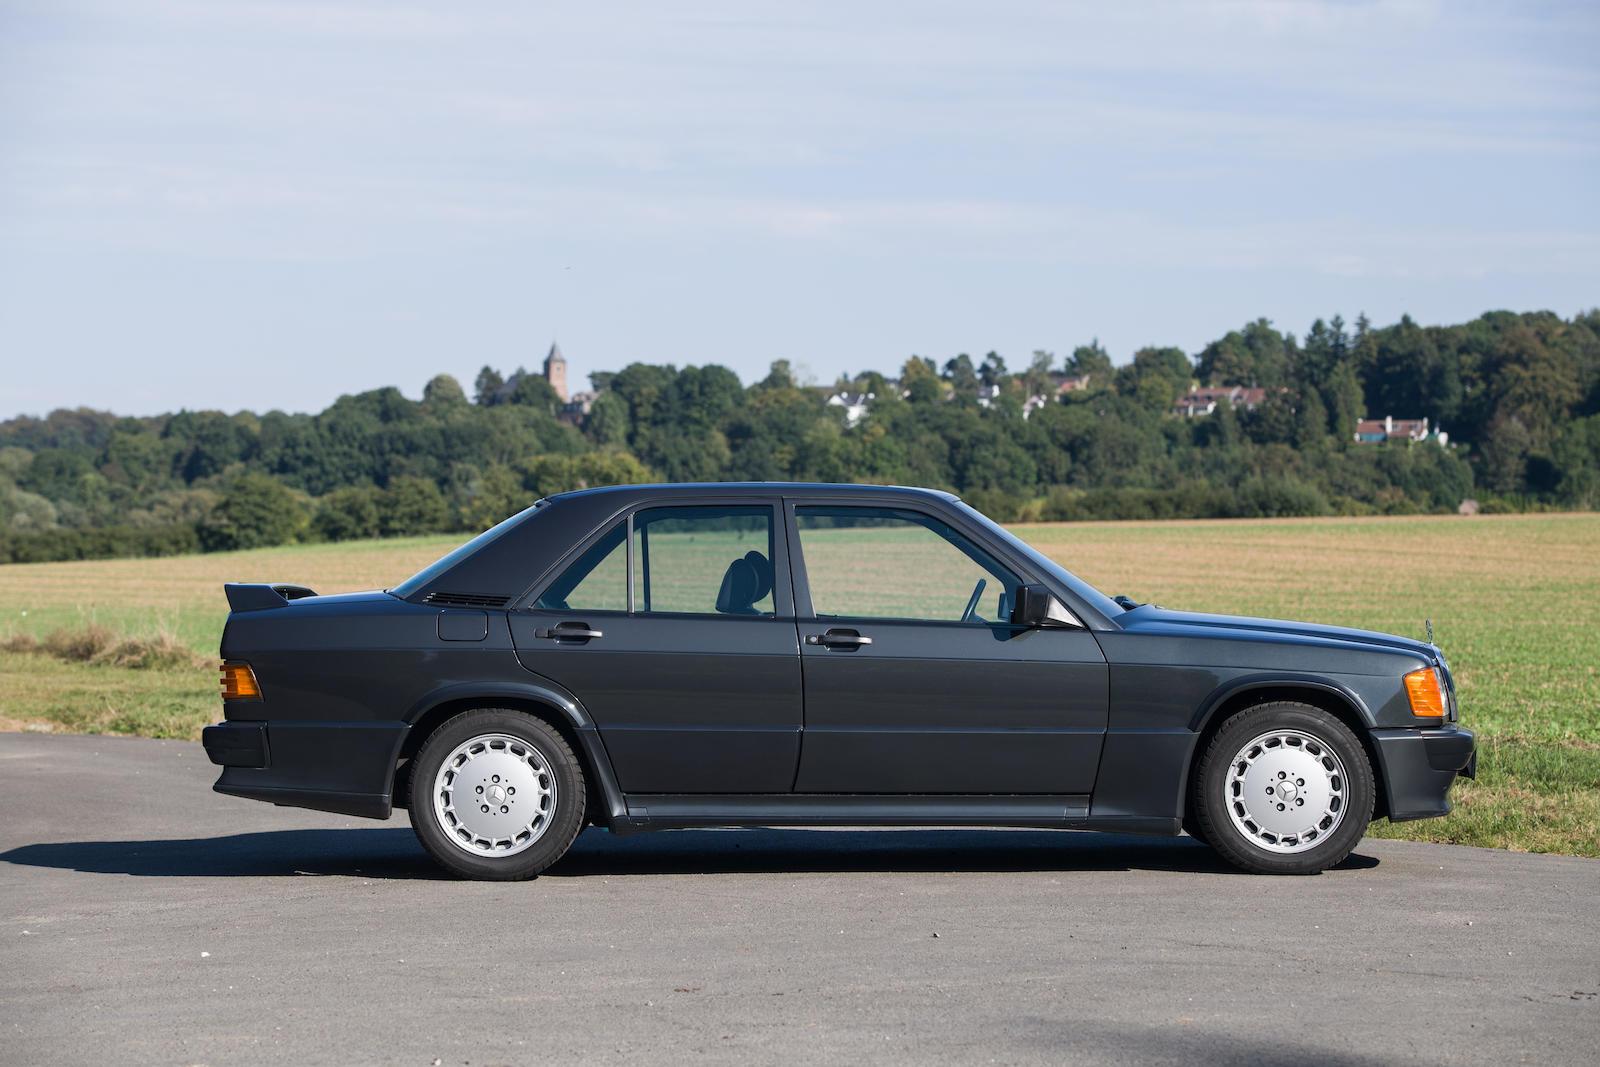 1985 Mercedes-Benz 190E 2.3-16 Sports Saloon side profile